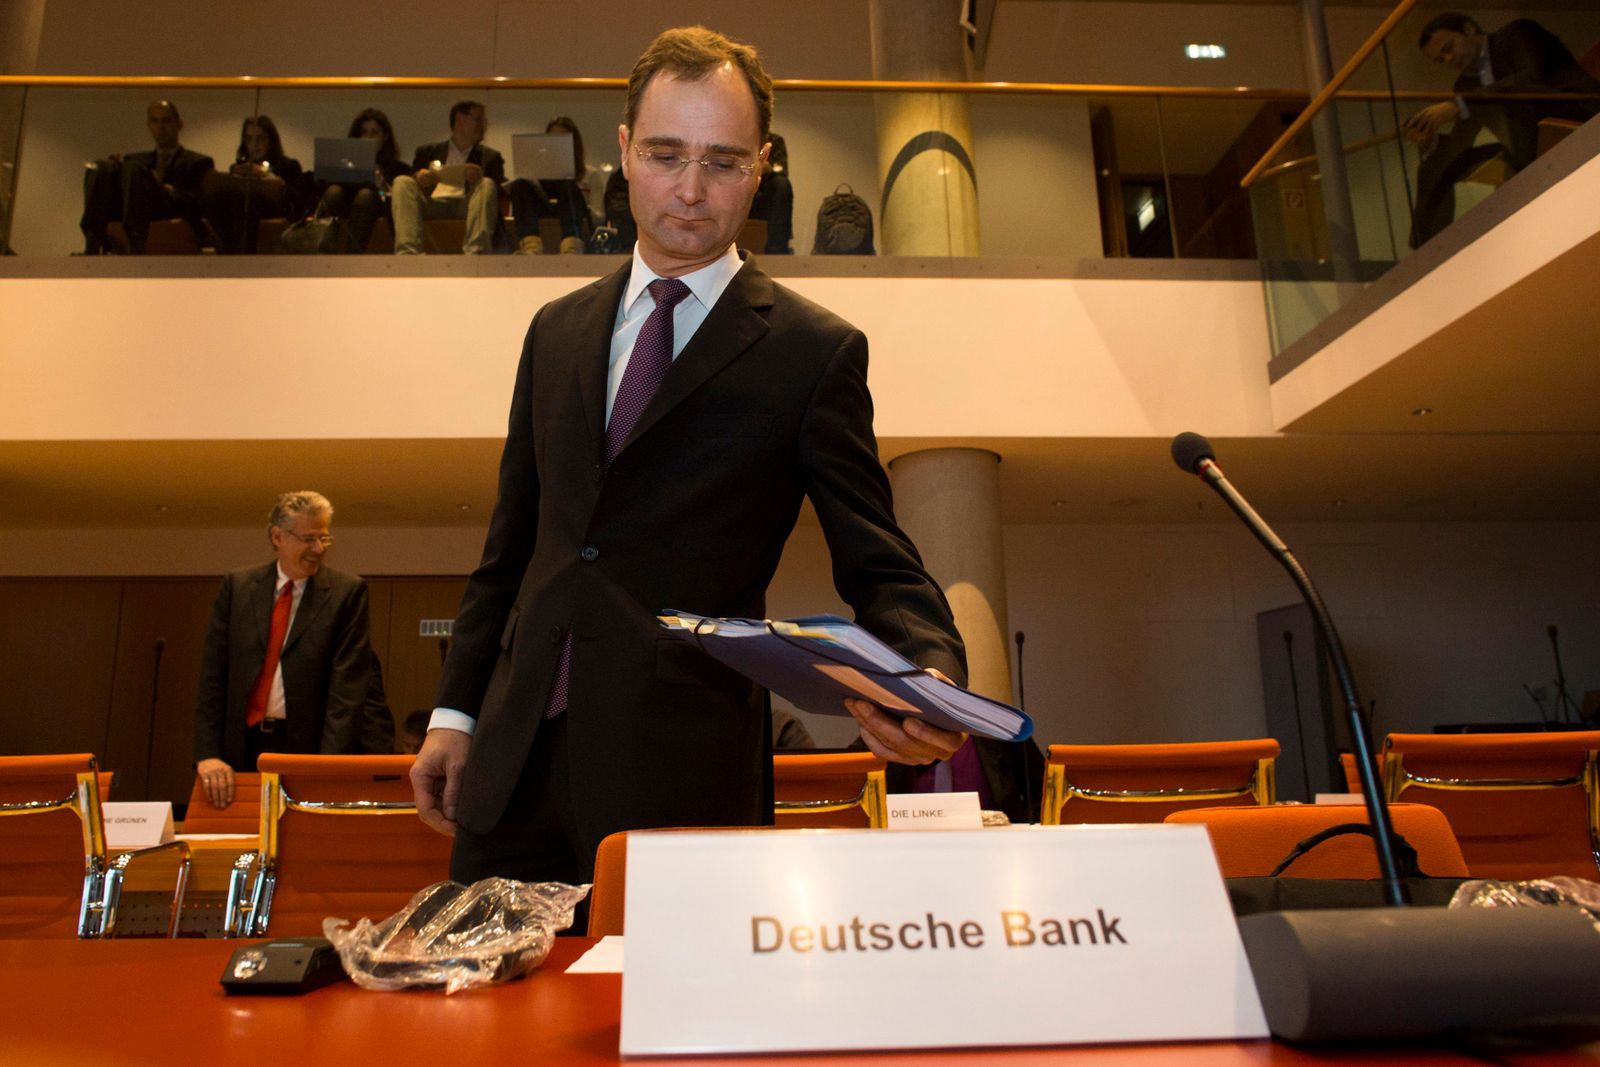 Deutsche Bank / Stephan Leithner